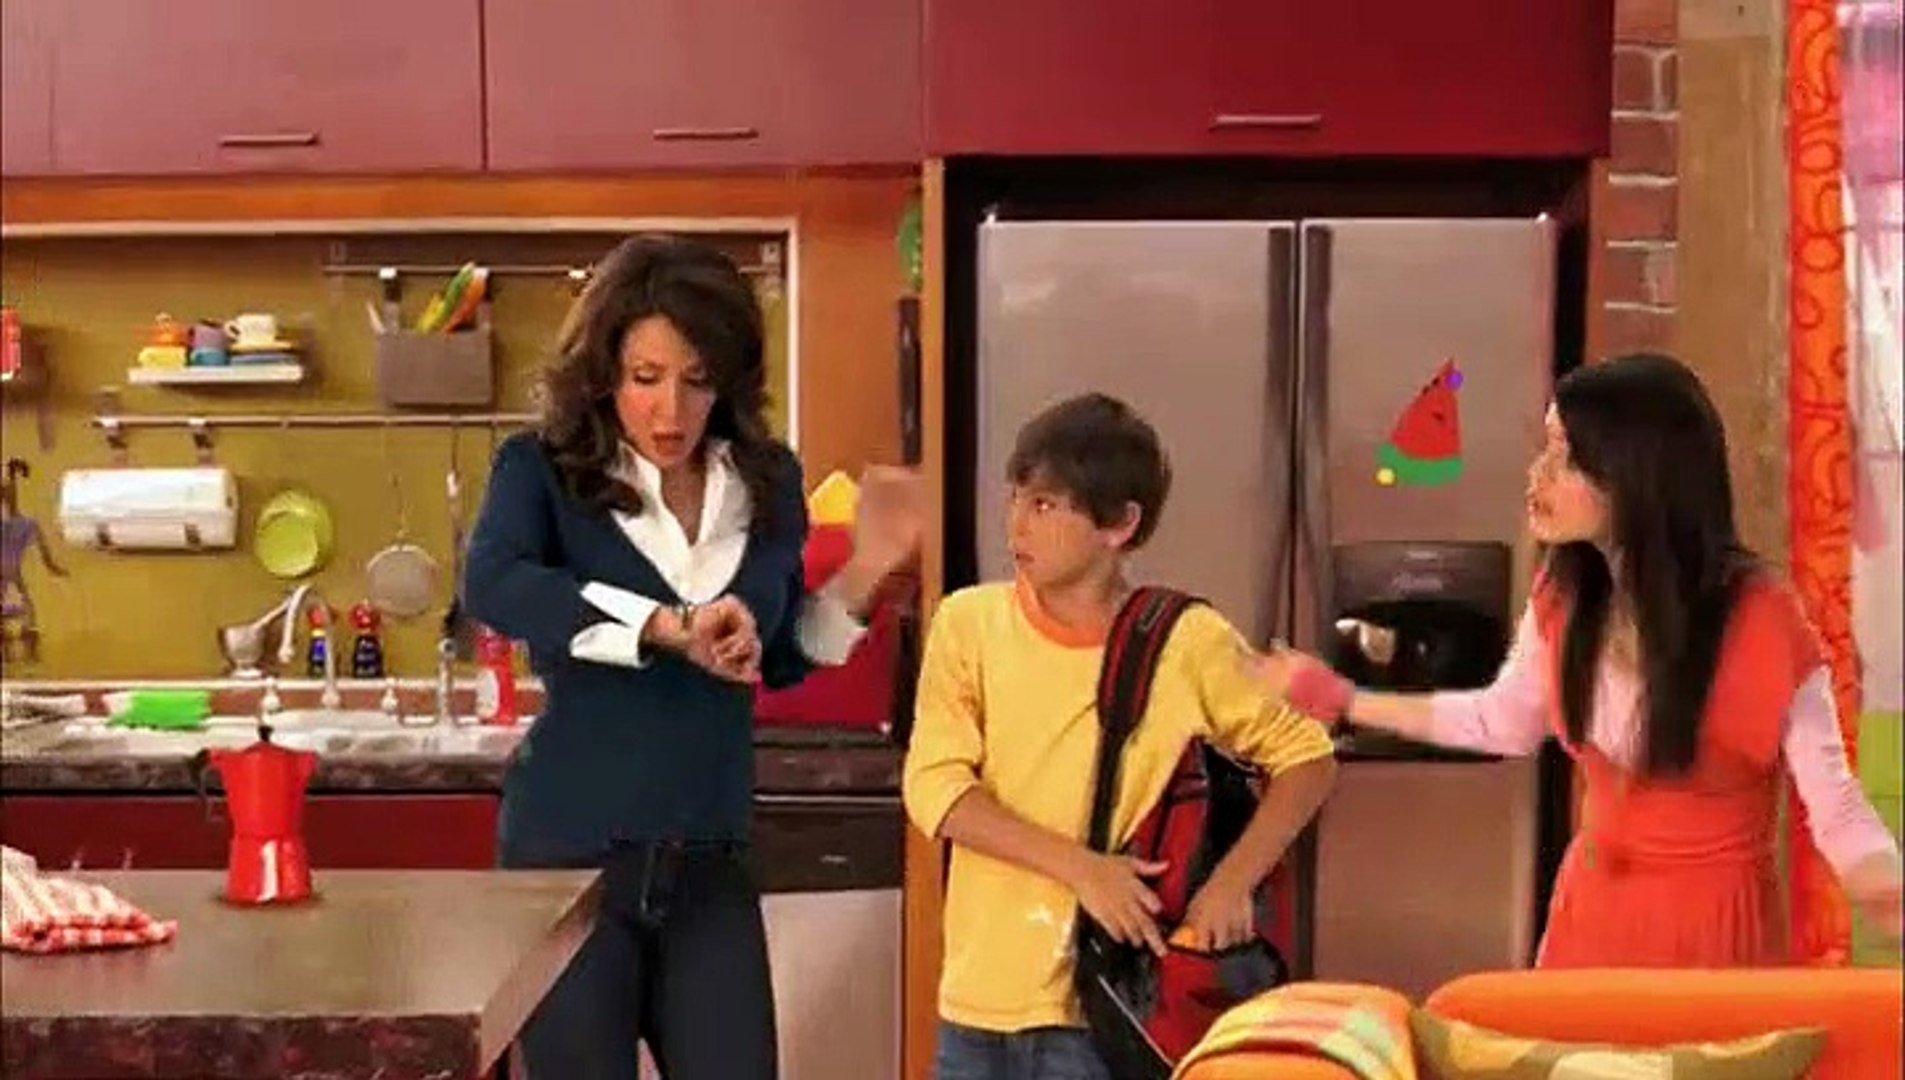 Wizards of Waverly Place S03 E12 - Dude Looks Like Shakira